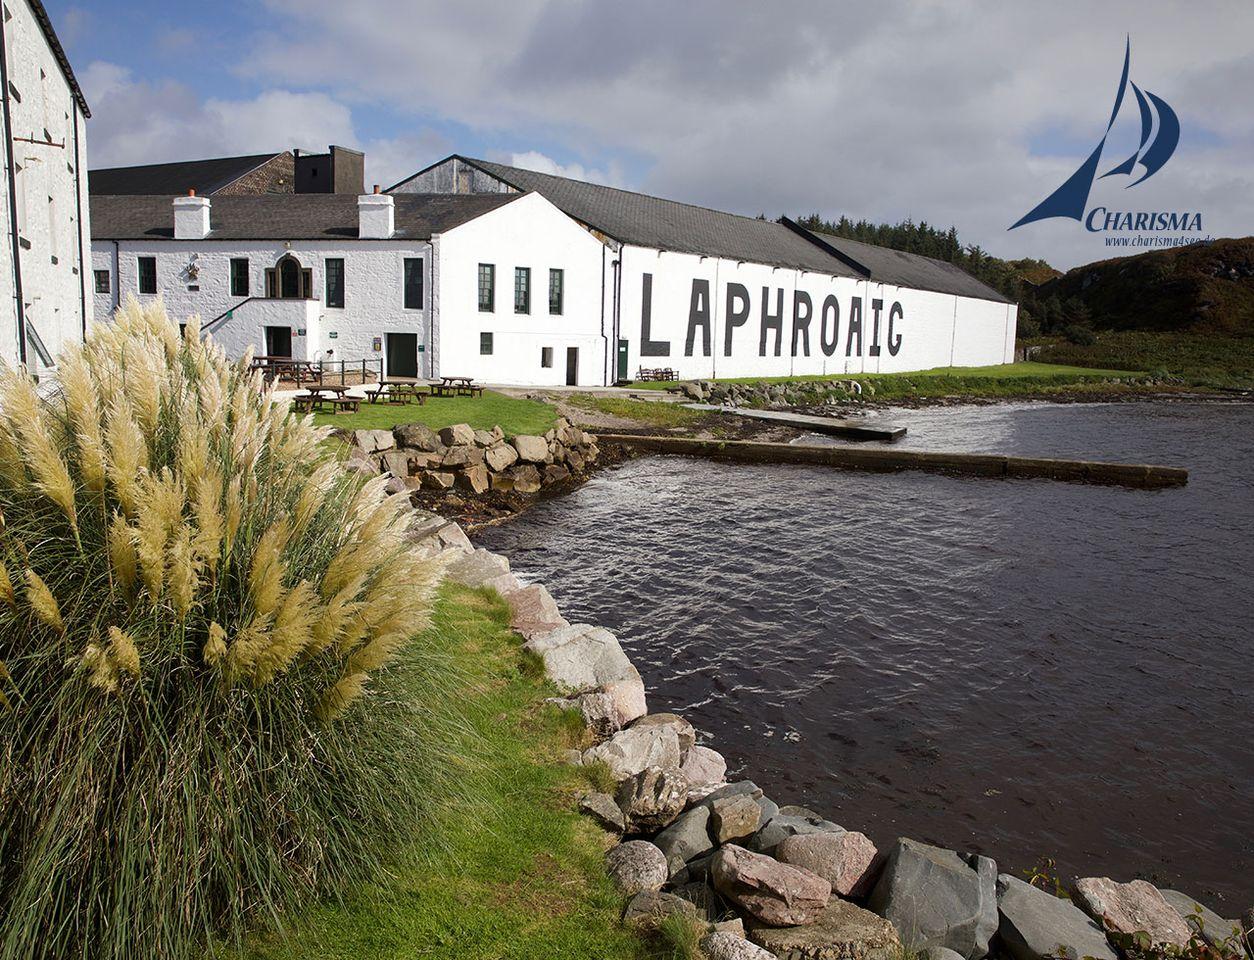 Laphroaig, Islay